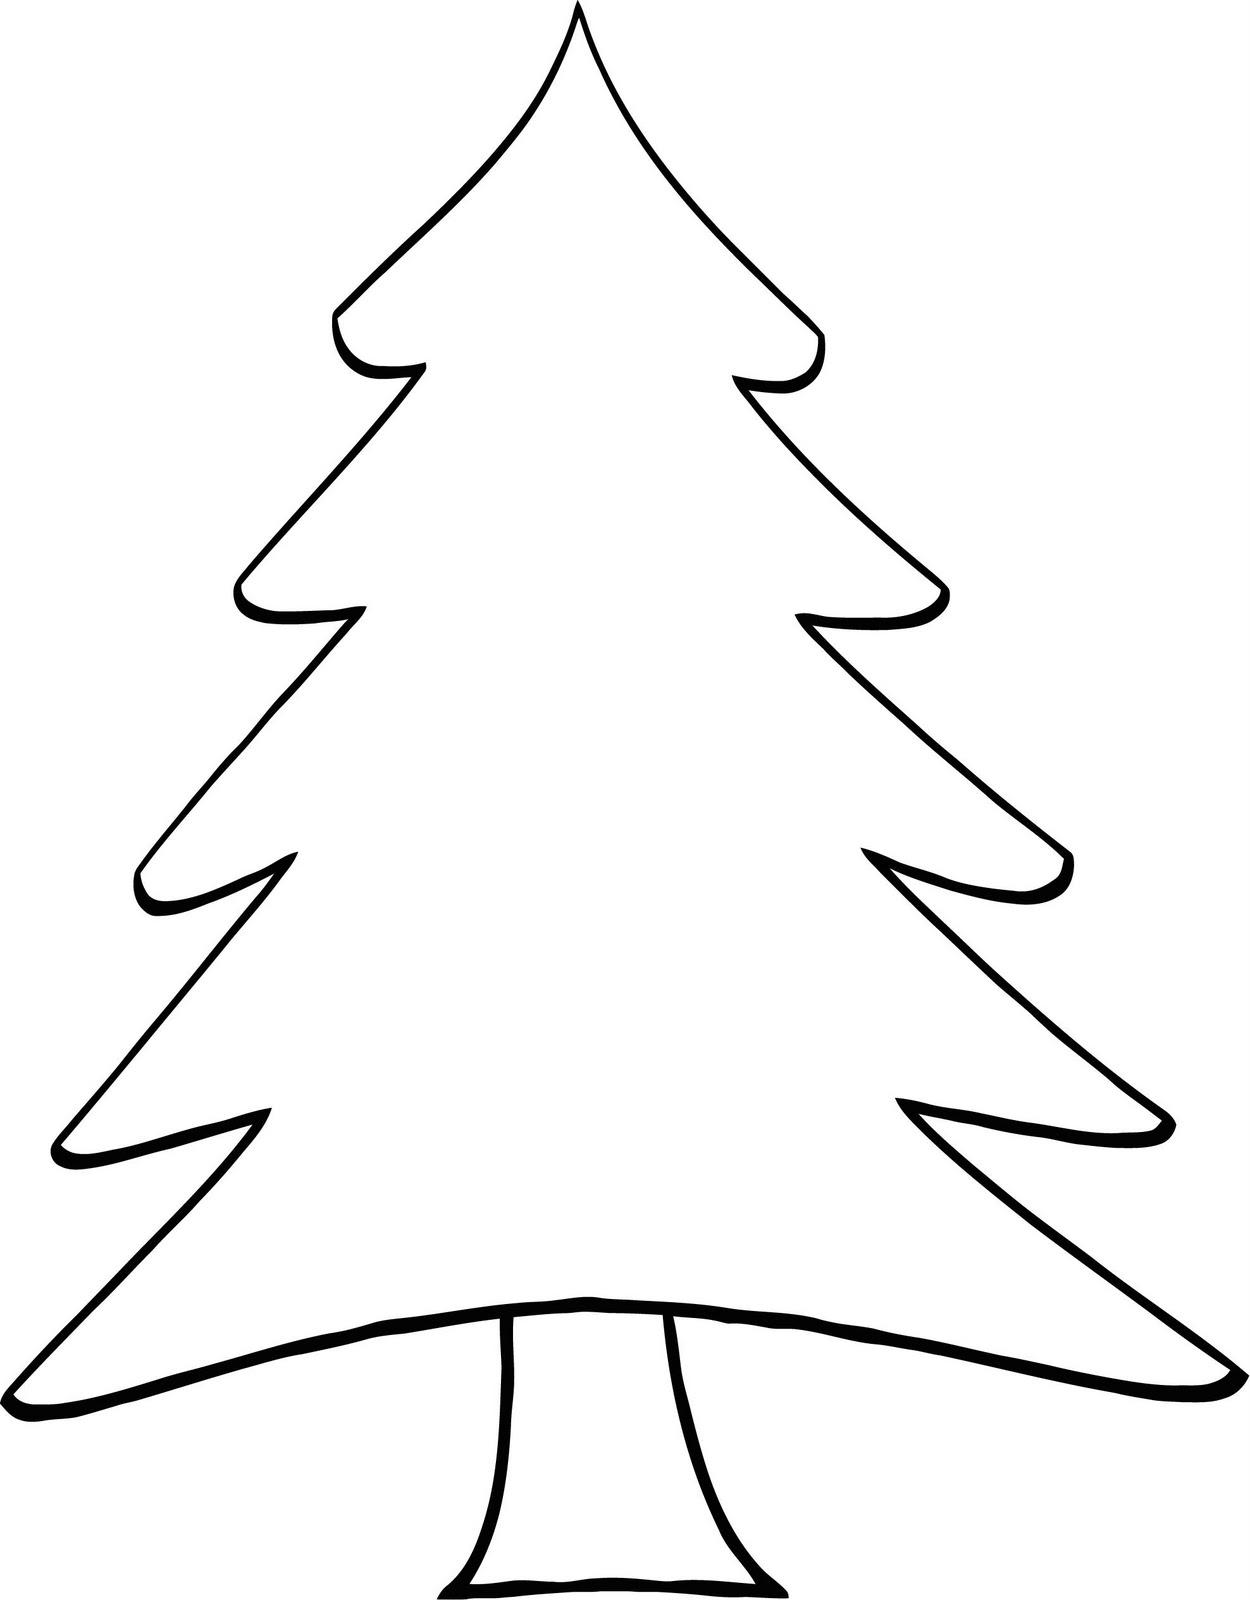 Pine tree clipart black and white Best of Pine tree cartoon.